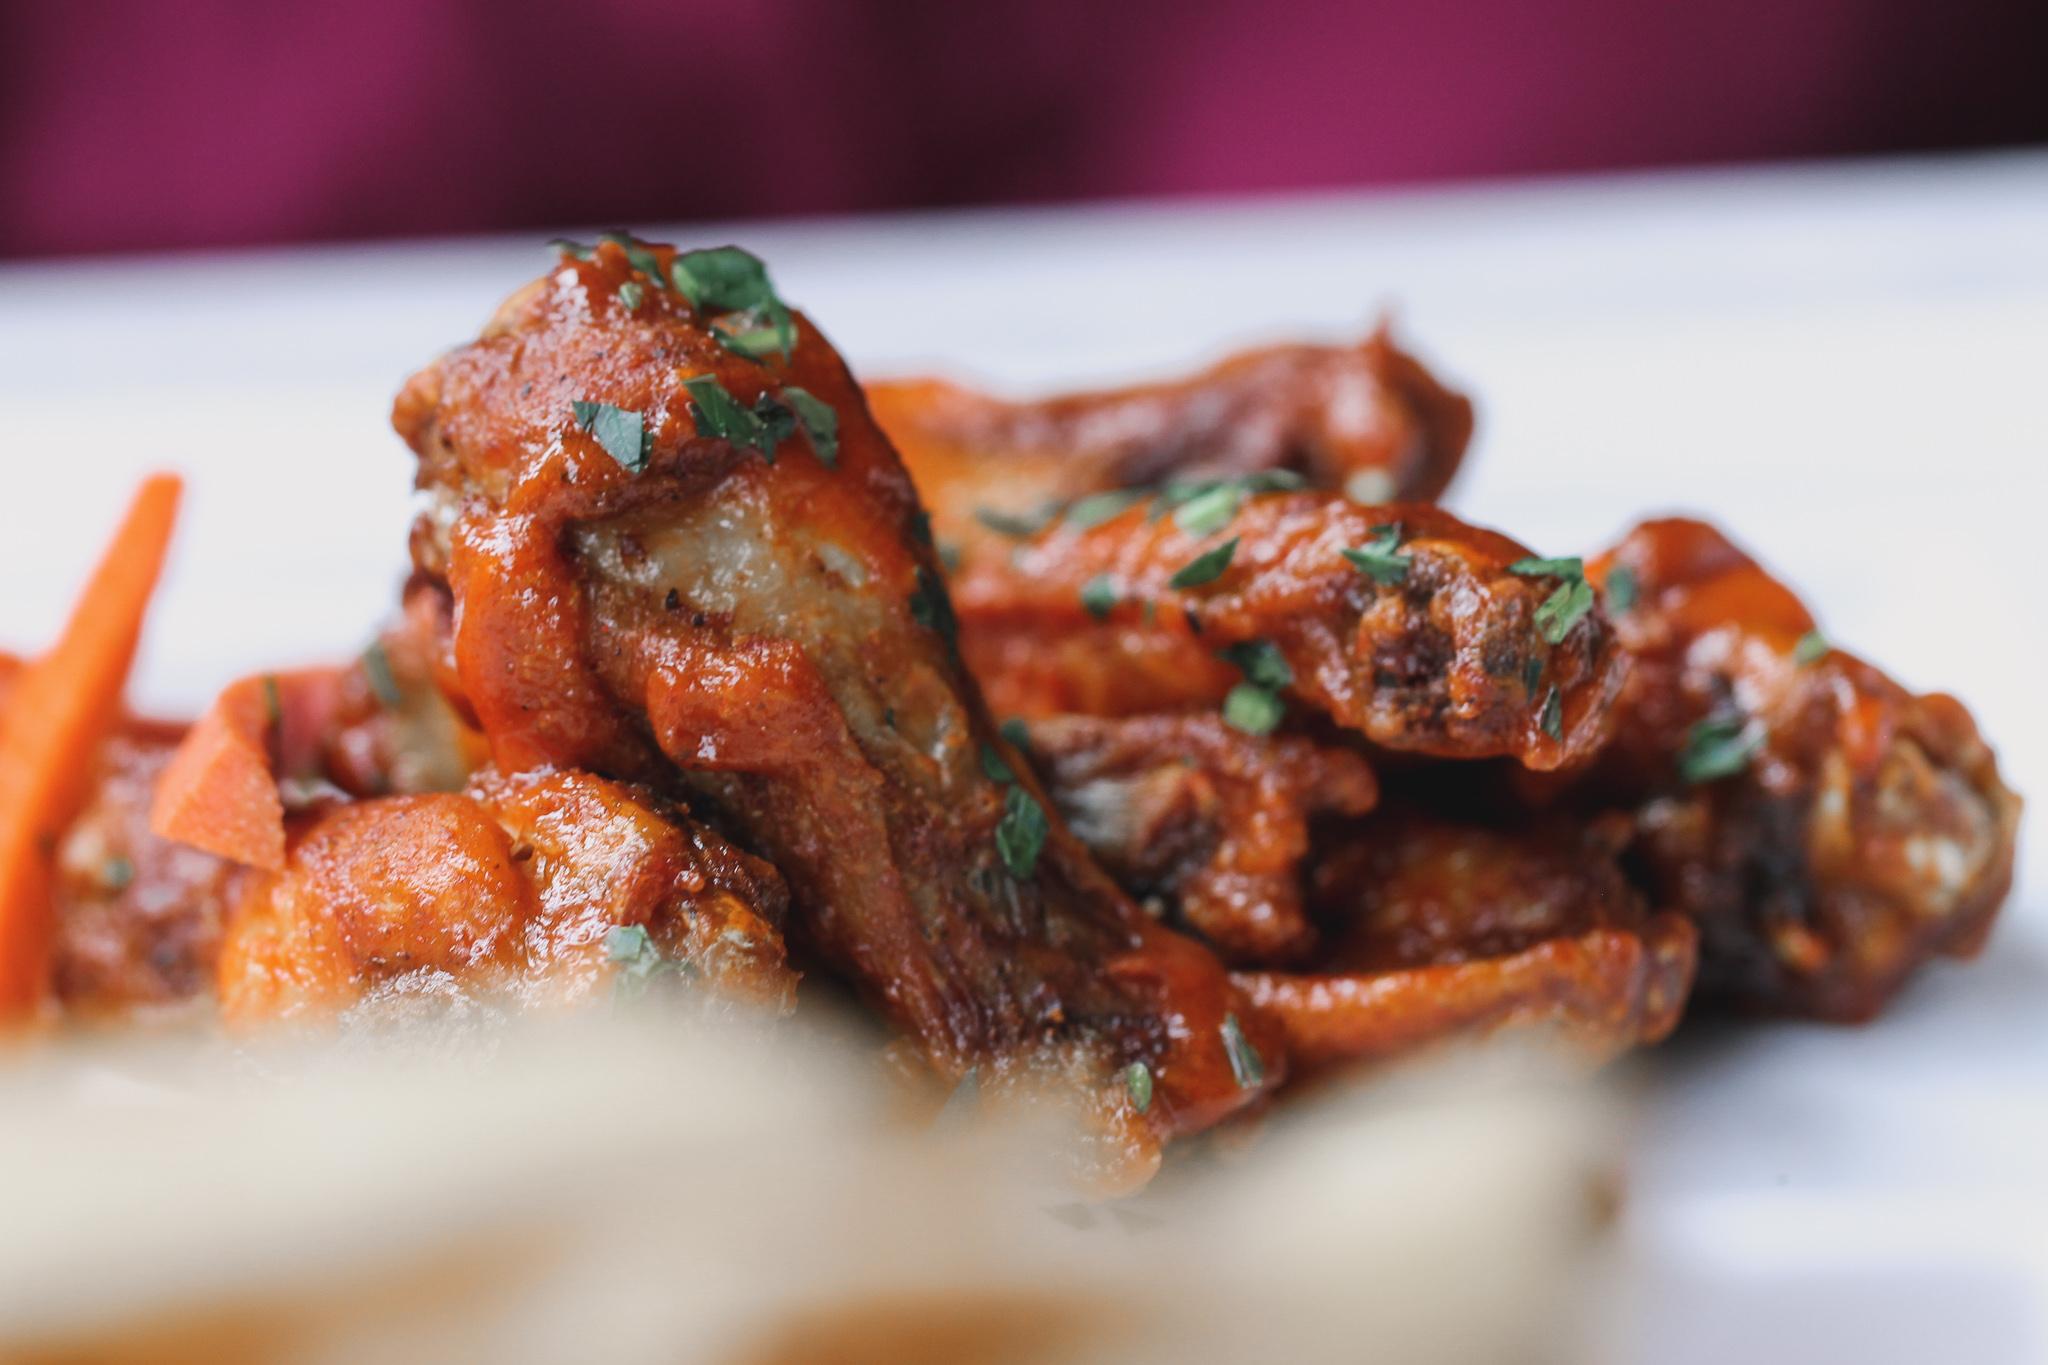 Cambria Dallas Hotel    House Wings  Guajillo BBQ or Buffalo with Pickled Carrots + Ranch